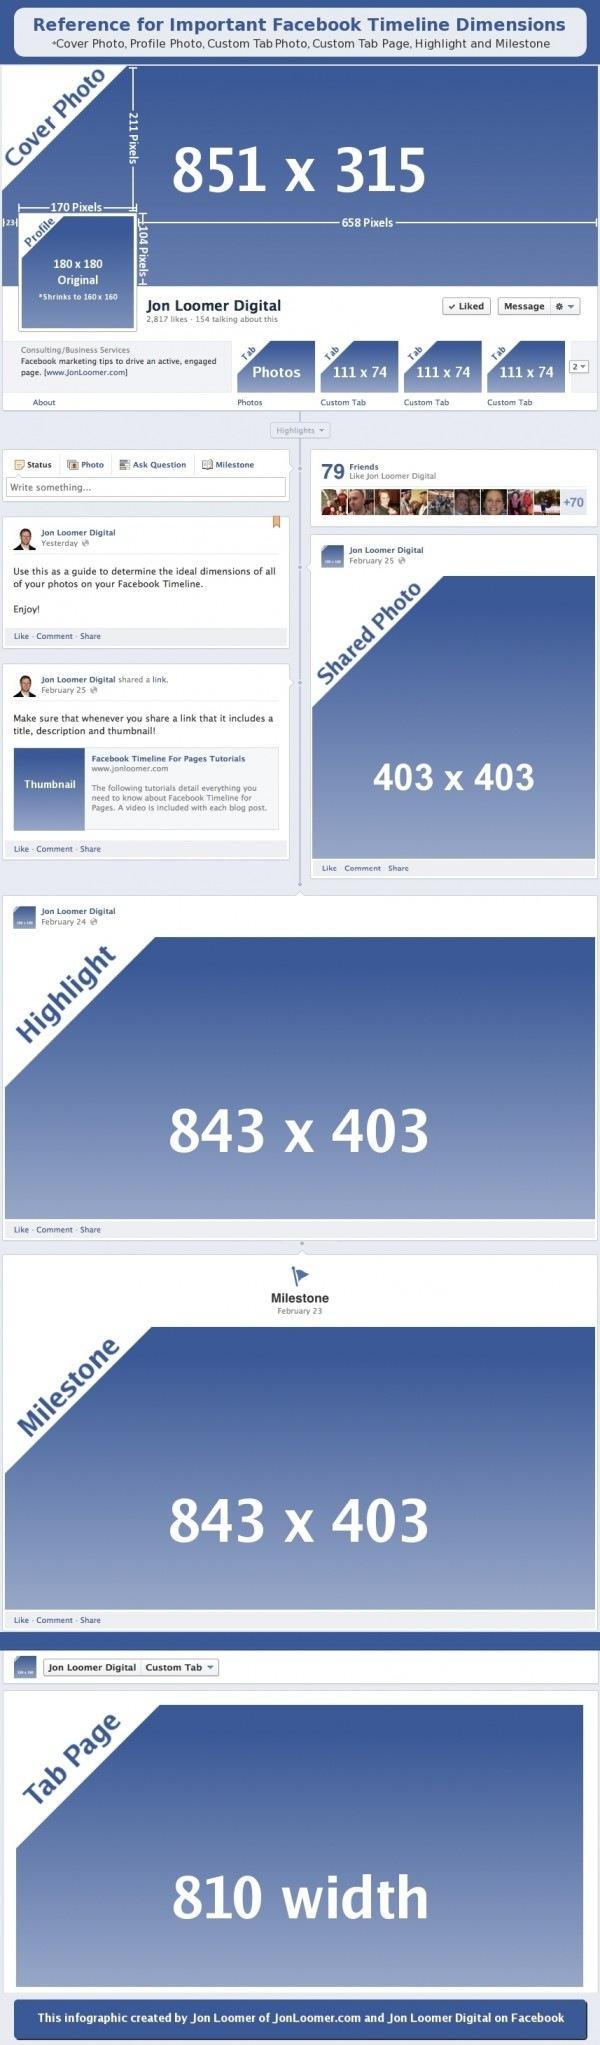 FacebookTimelineImageDimensions6-600x2045